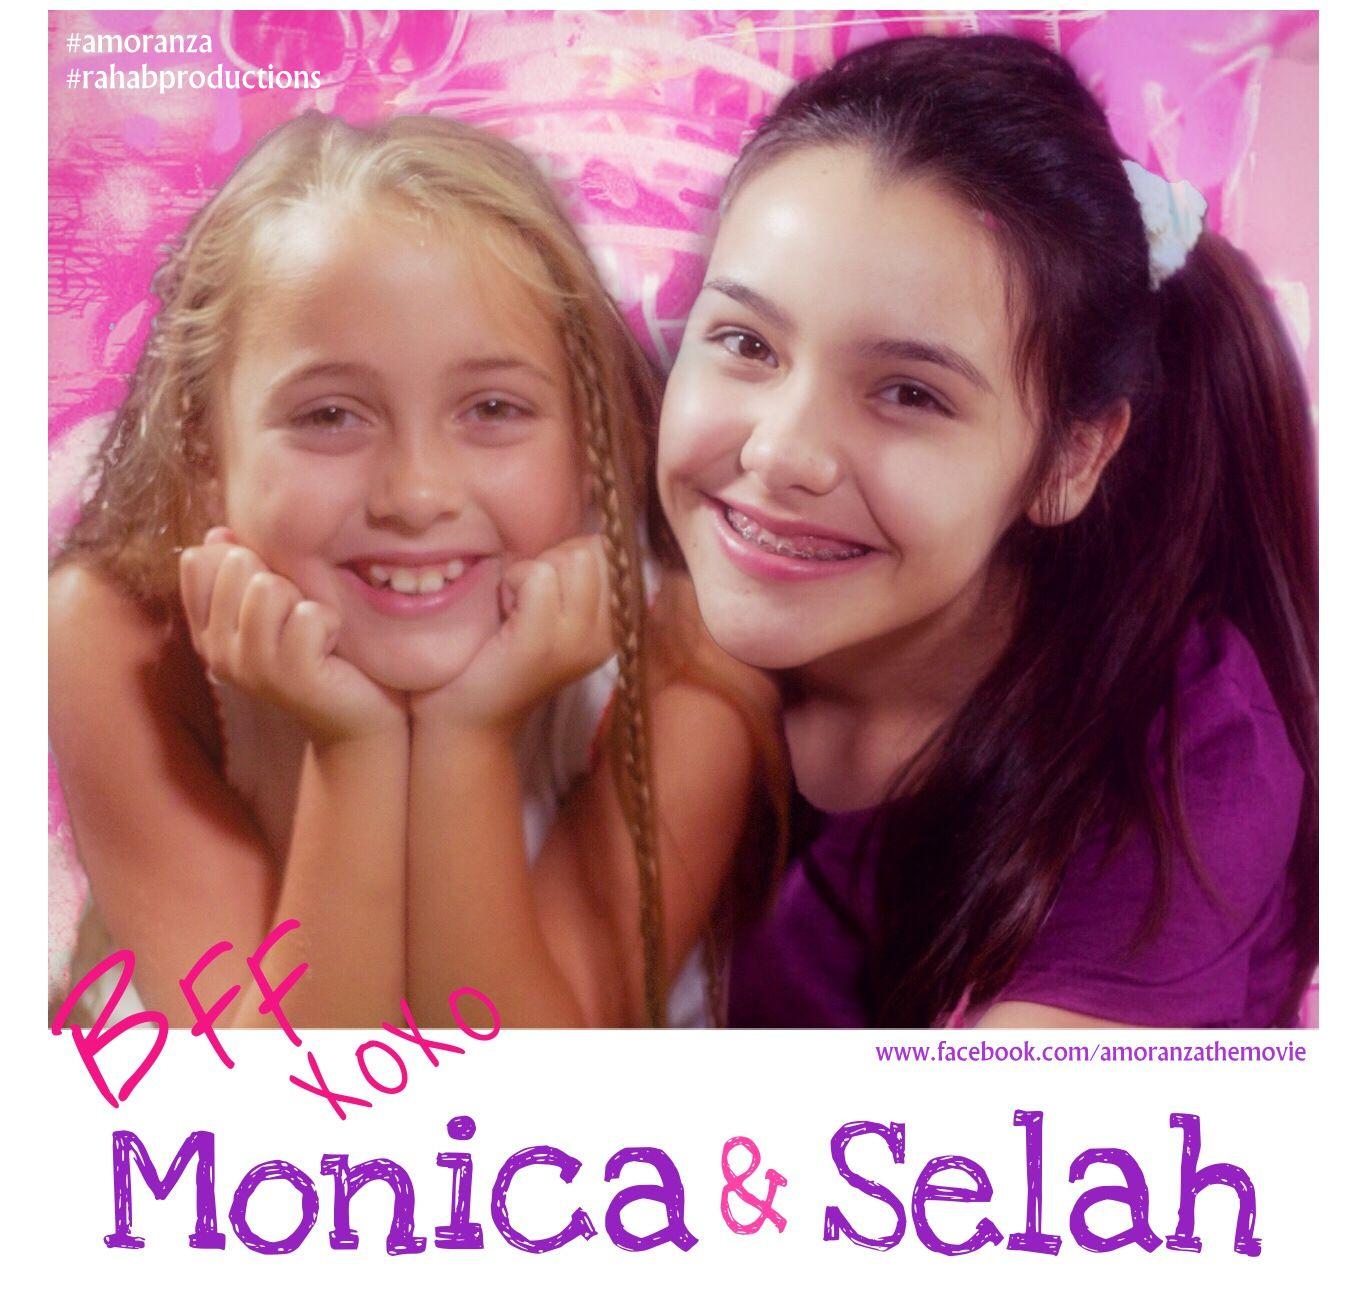 Ryan App as Monica  Celine Borroto Alvarez as Young Selah